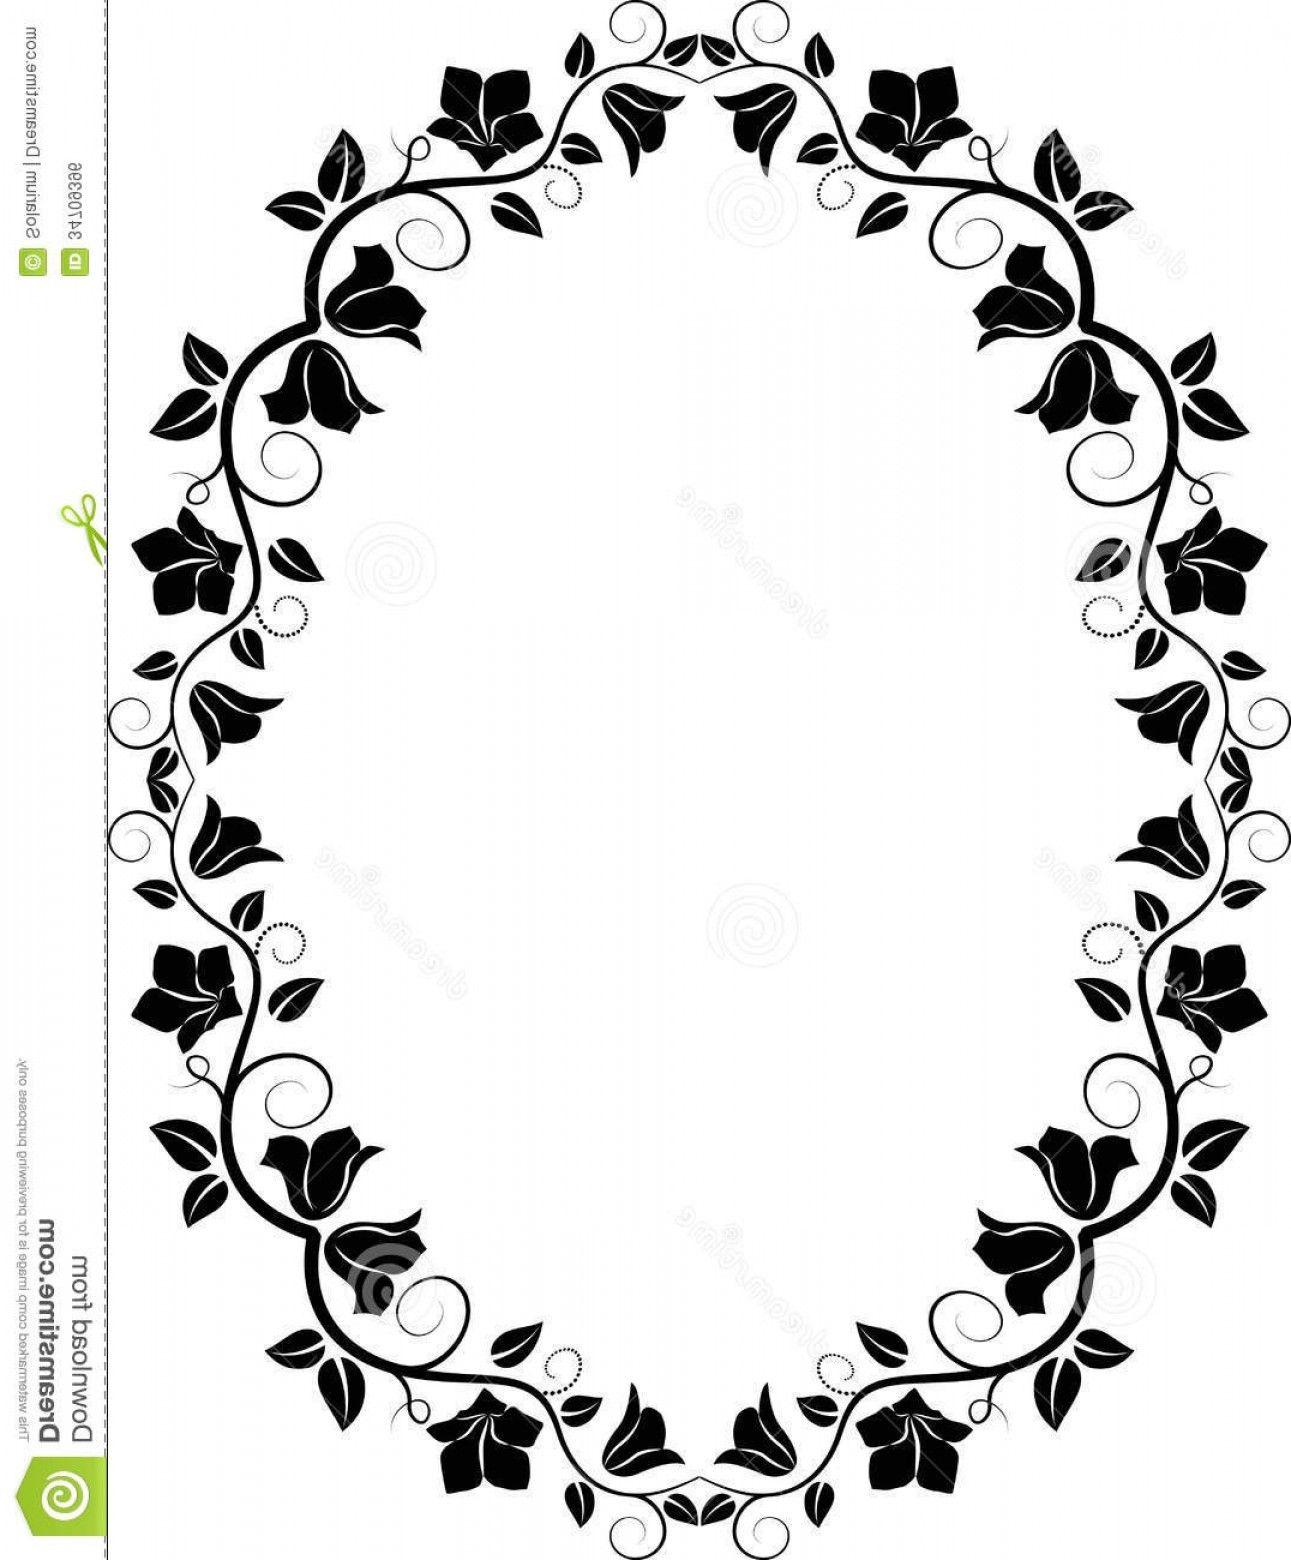 Png Clipart Oval Flower Border Vector Flowers Healthy Stock Floral Frame Filhouette Color Picker Image Vector And Clipart Vector Flowers Flower Border Clip Art